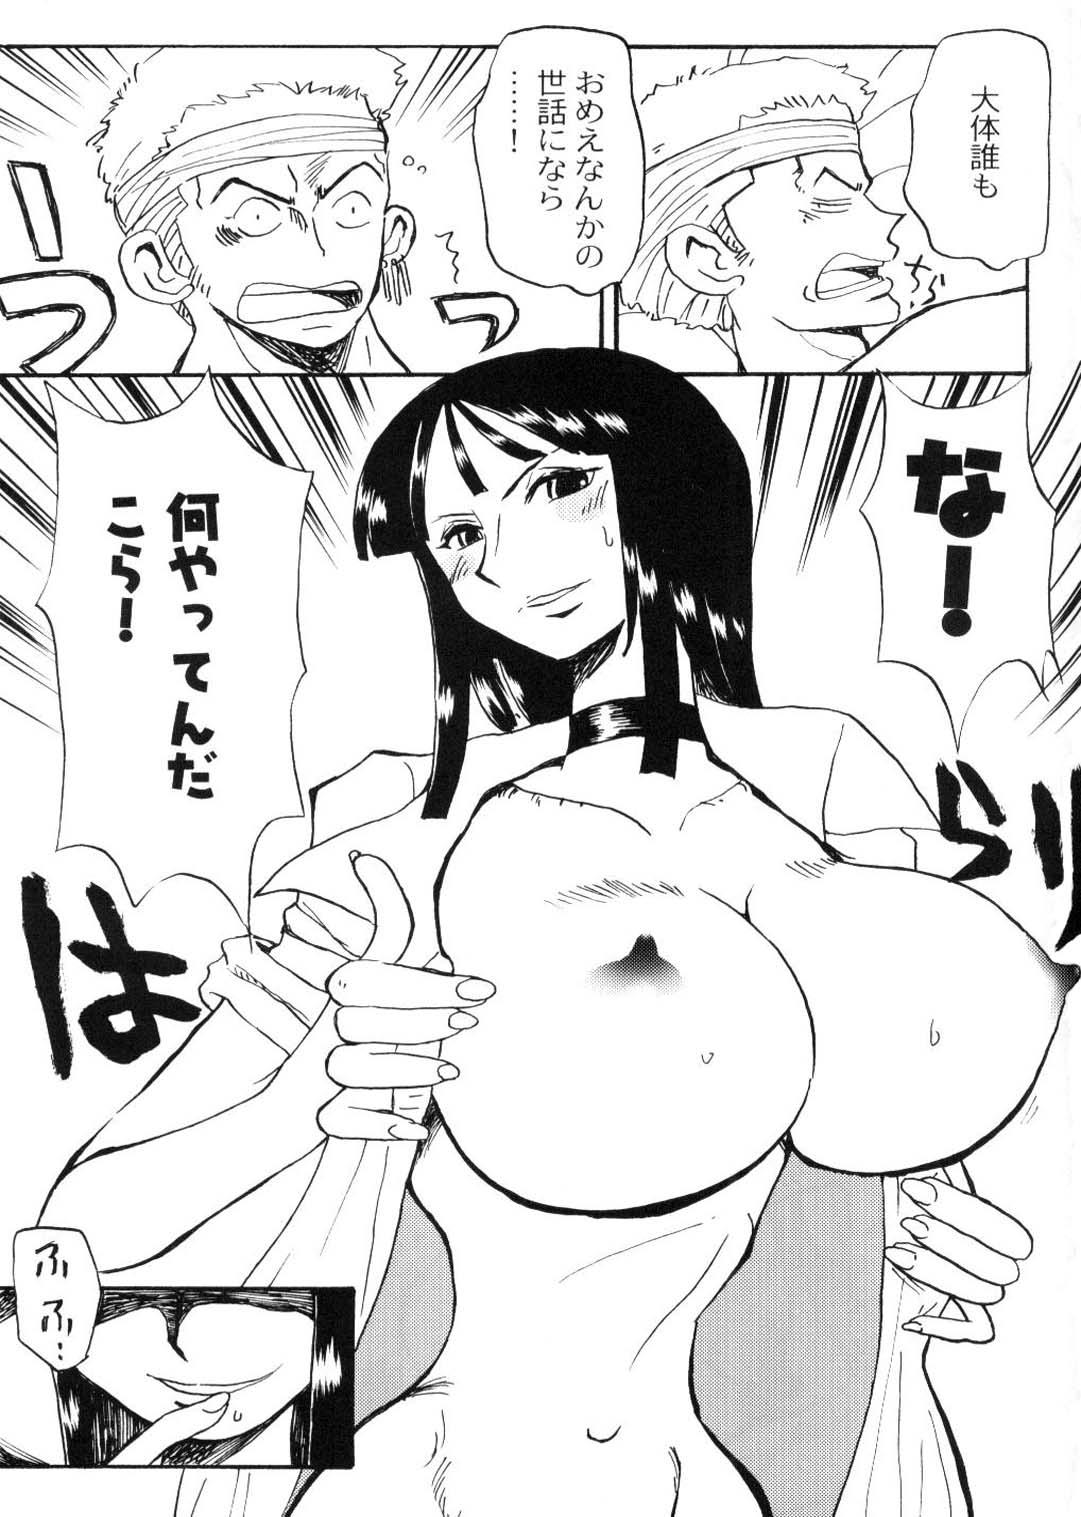 Nicozoro Namicho 8